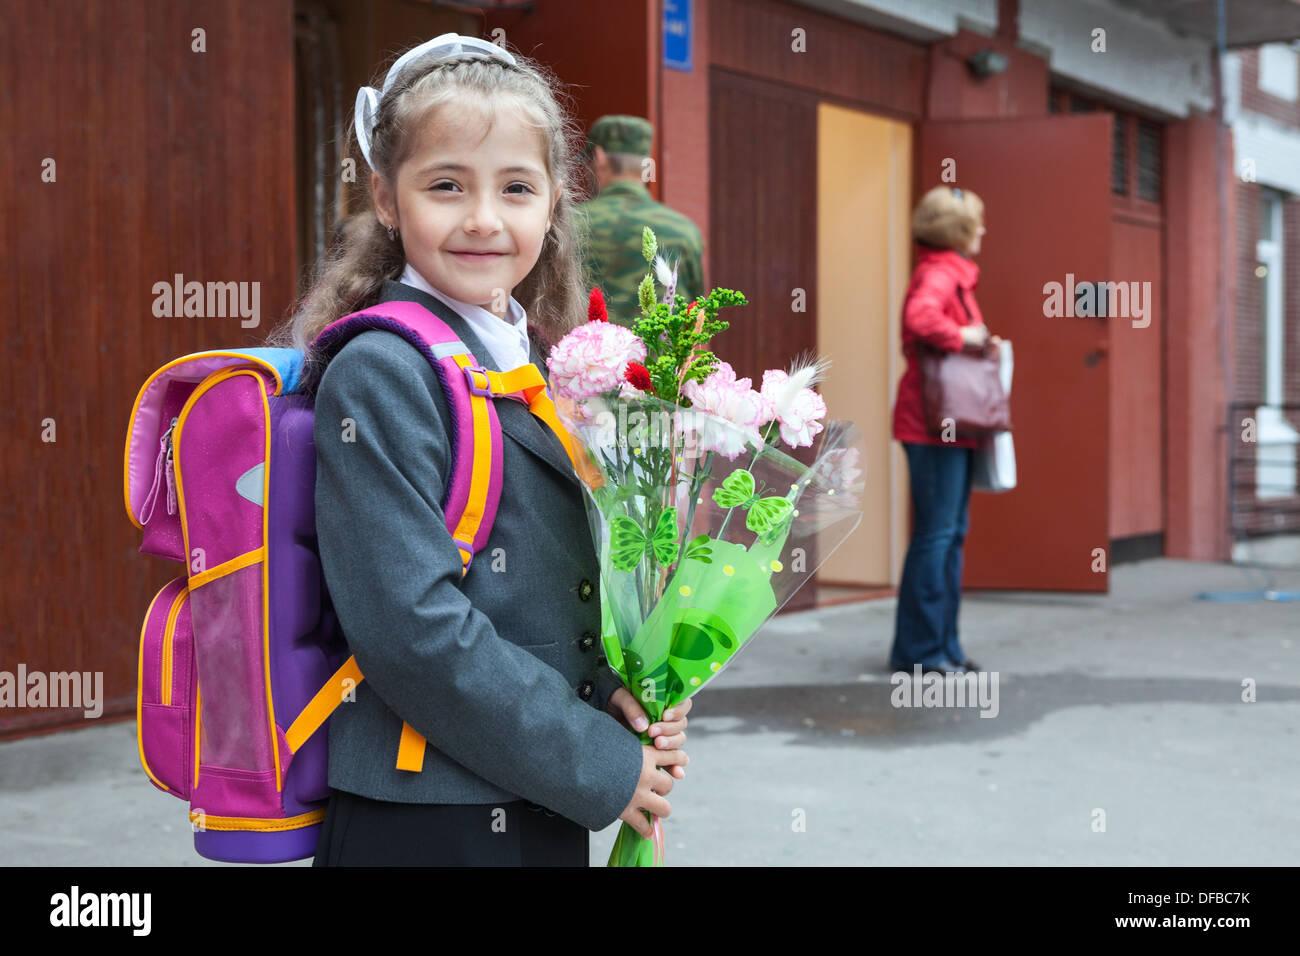 russian schoolgirl Russian schoolgirl with flowers in hands and schoolbag on the back going  back to school in September, 1, Russia